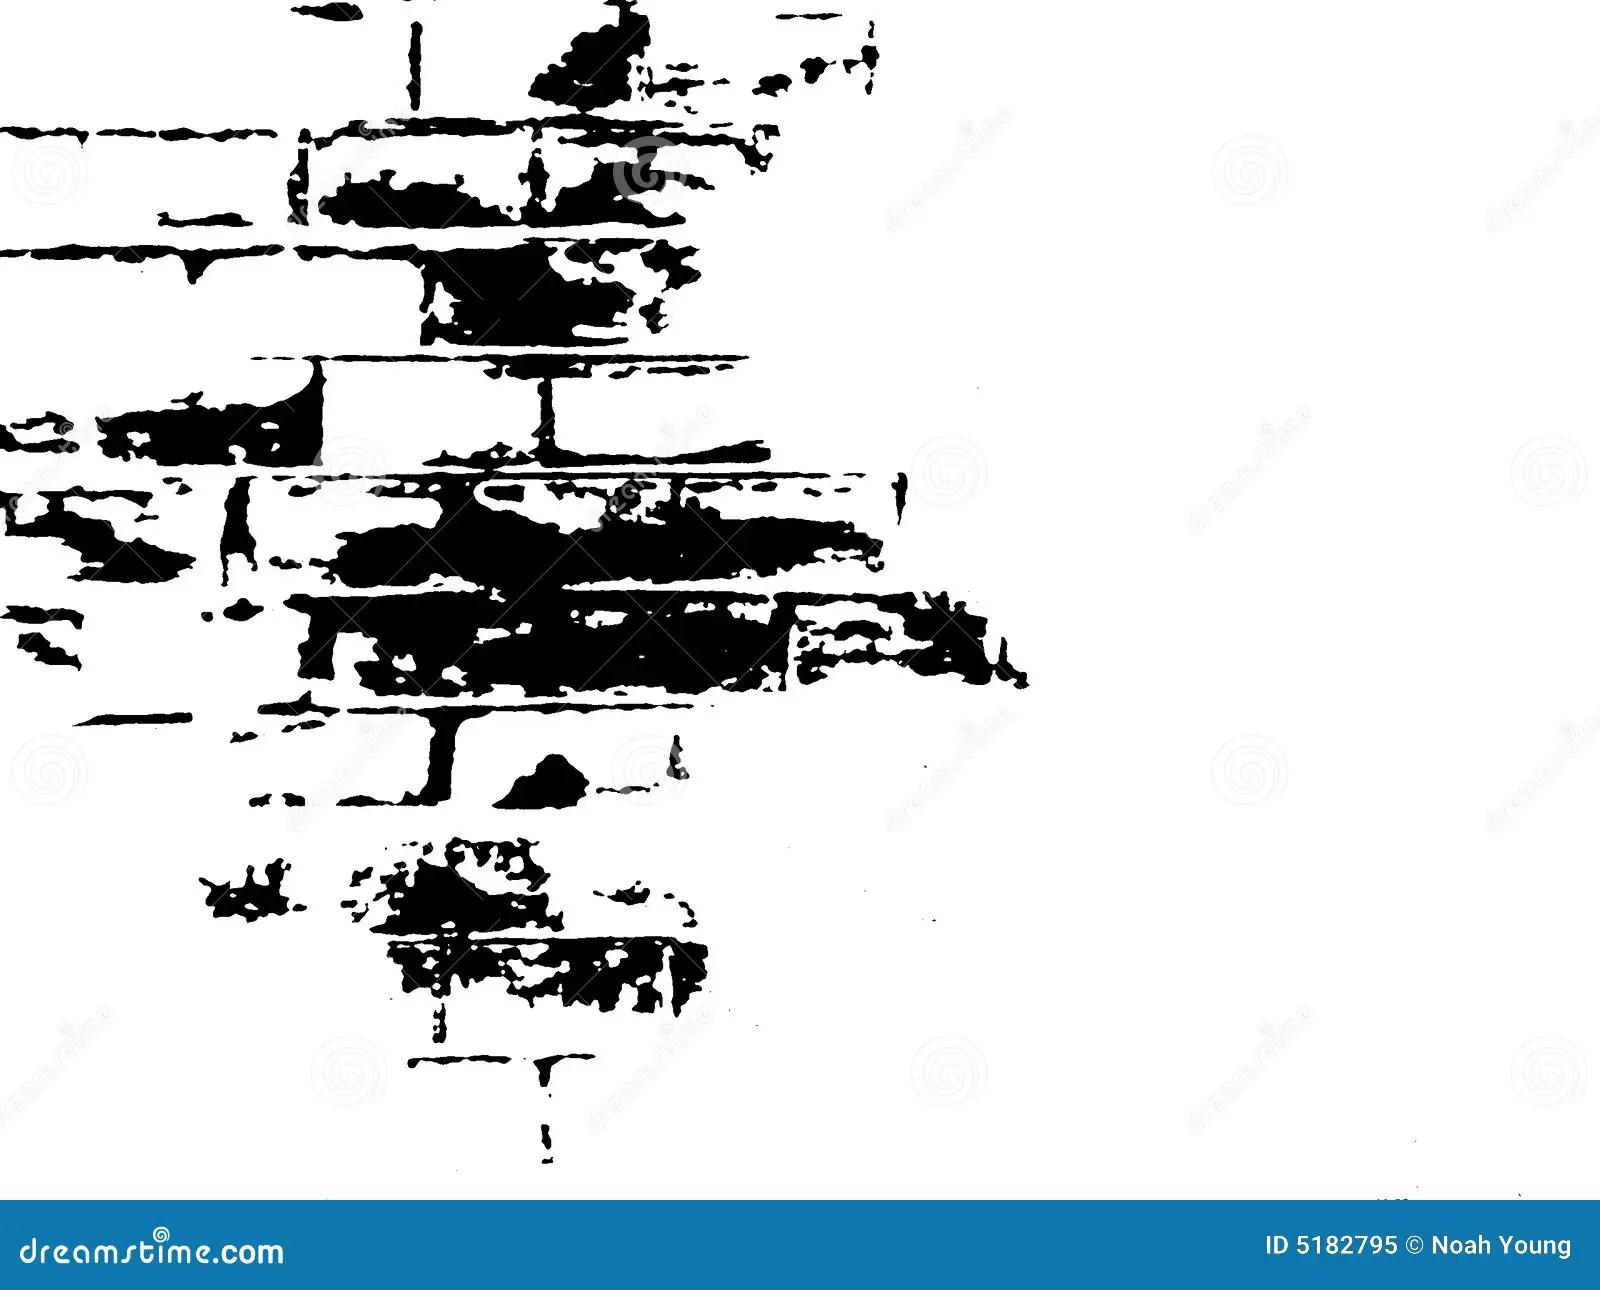 Brick Black And White Illustration Royalty Free Stock